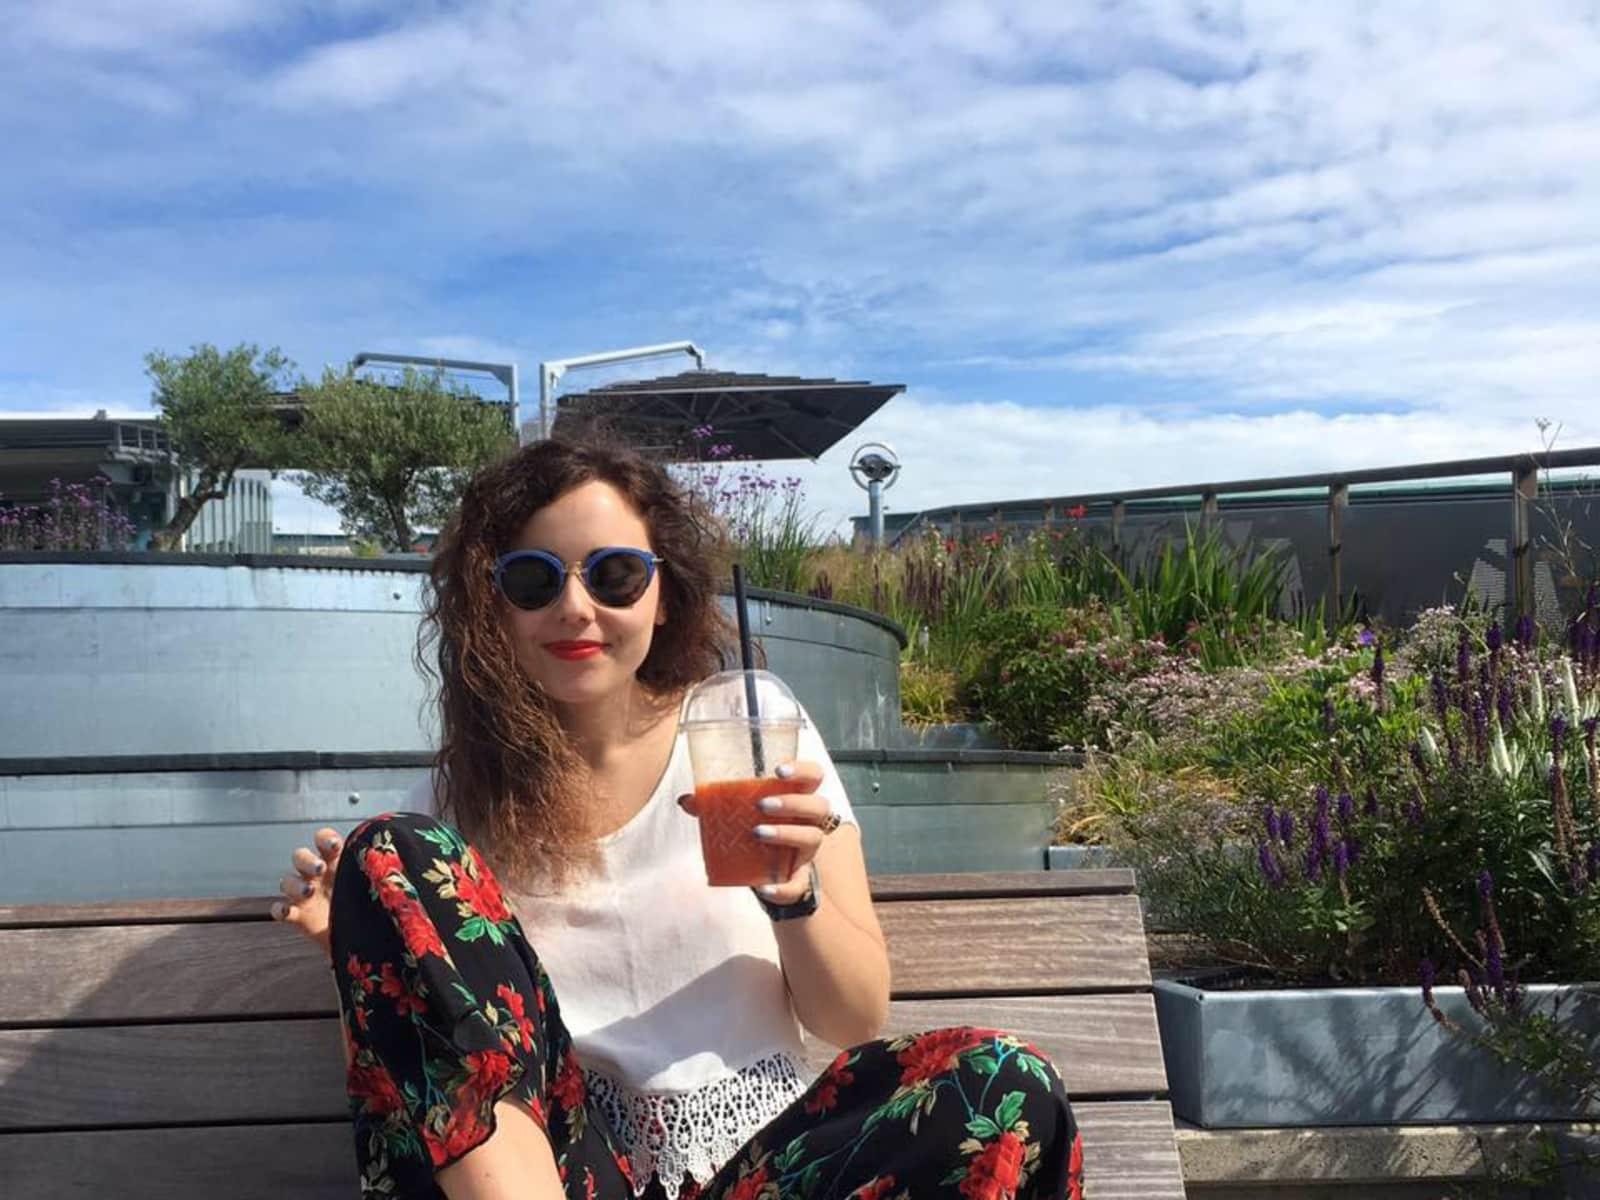 Nicola from Hobart, Tasmania, Australia